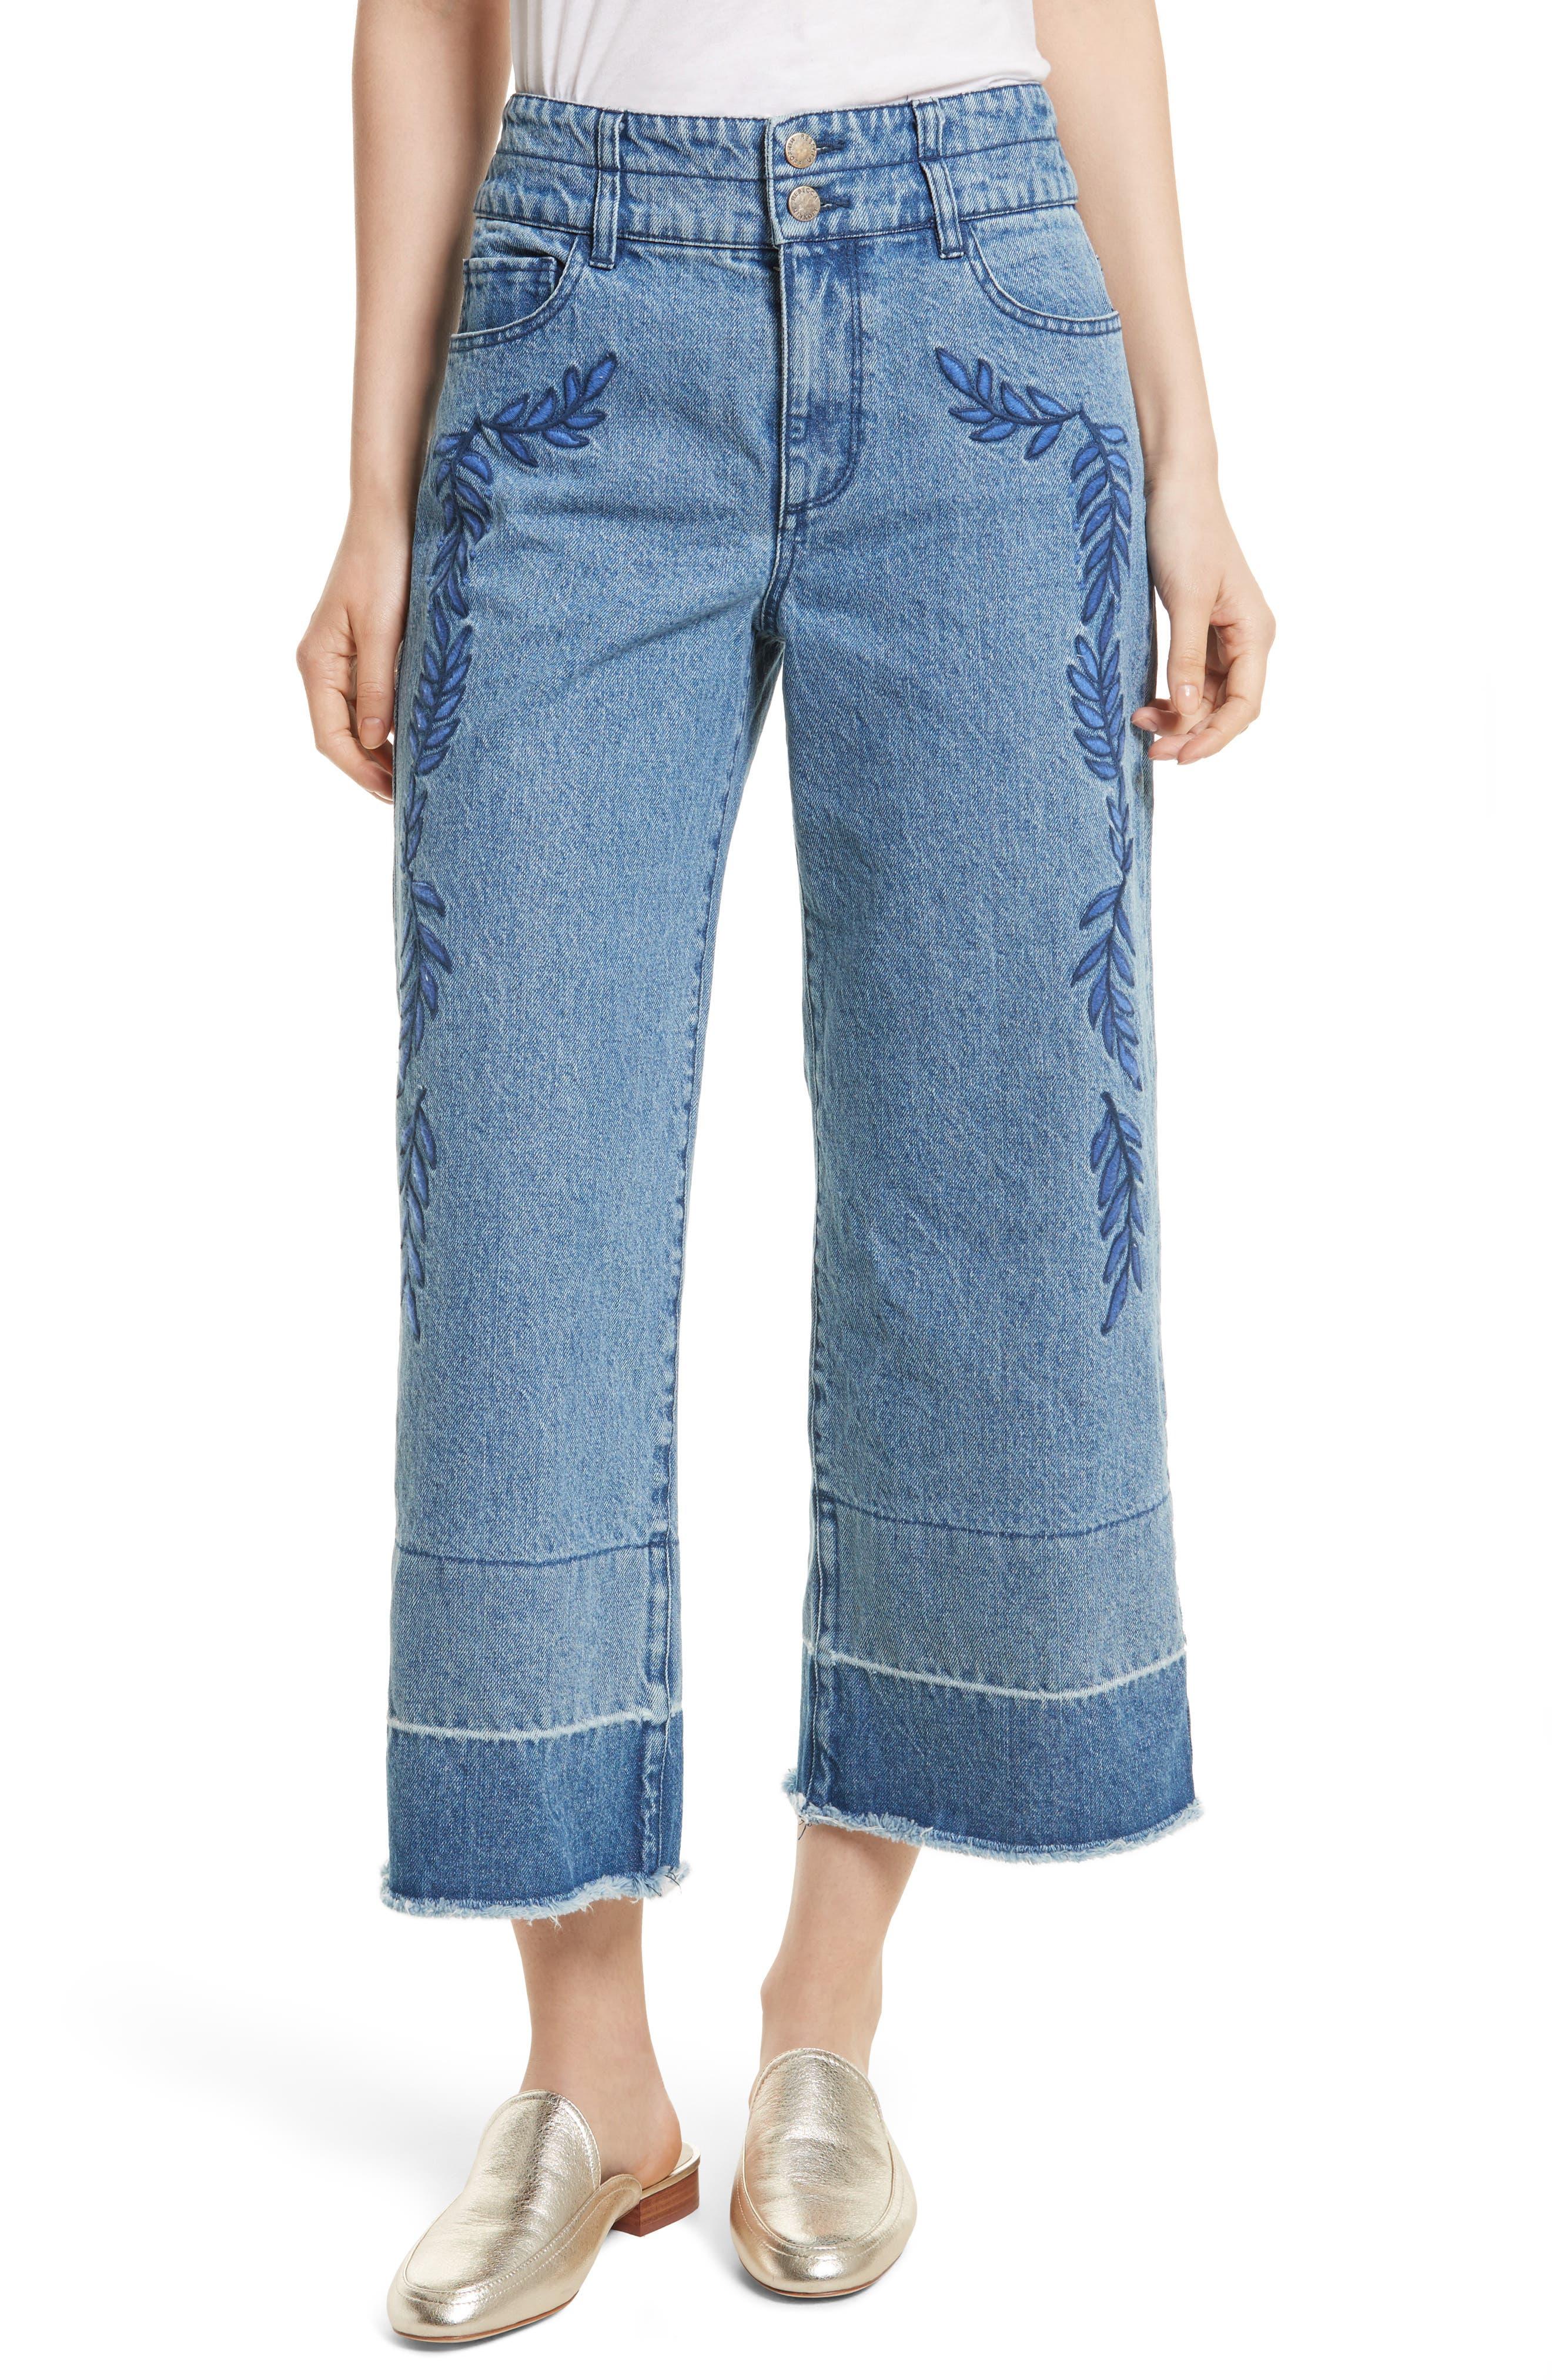 Rebecca Minkoff Starlight High Waist Crop Wide Leg Jeans (Midwash)